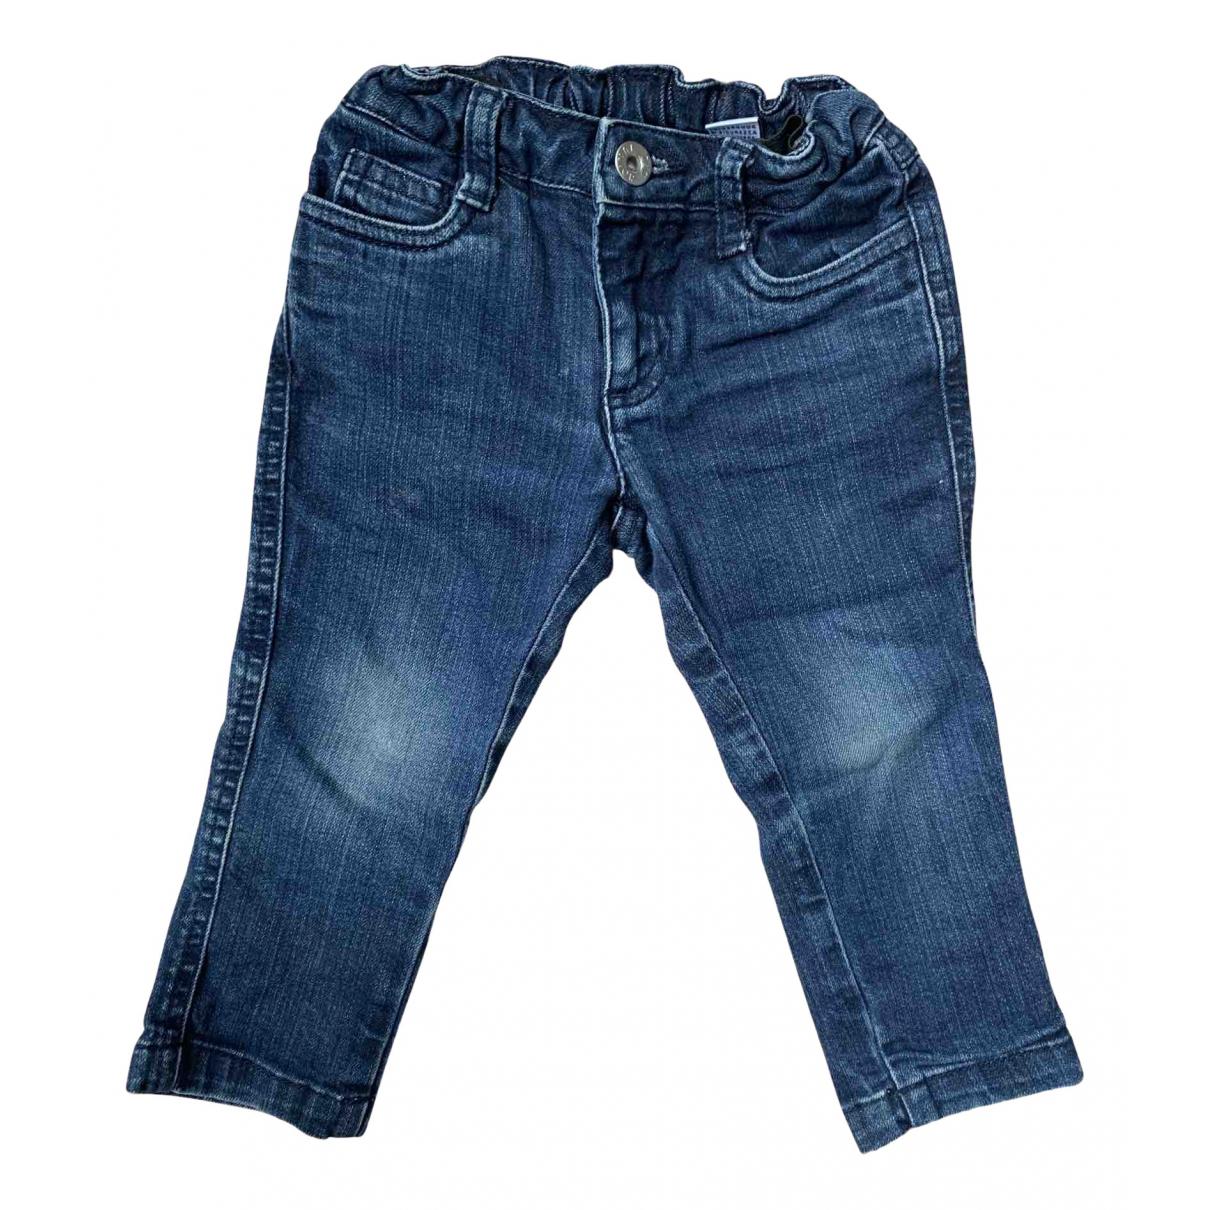 D&g - Pantalon   pour enfant en coton - bleu